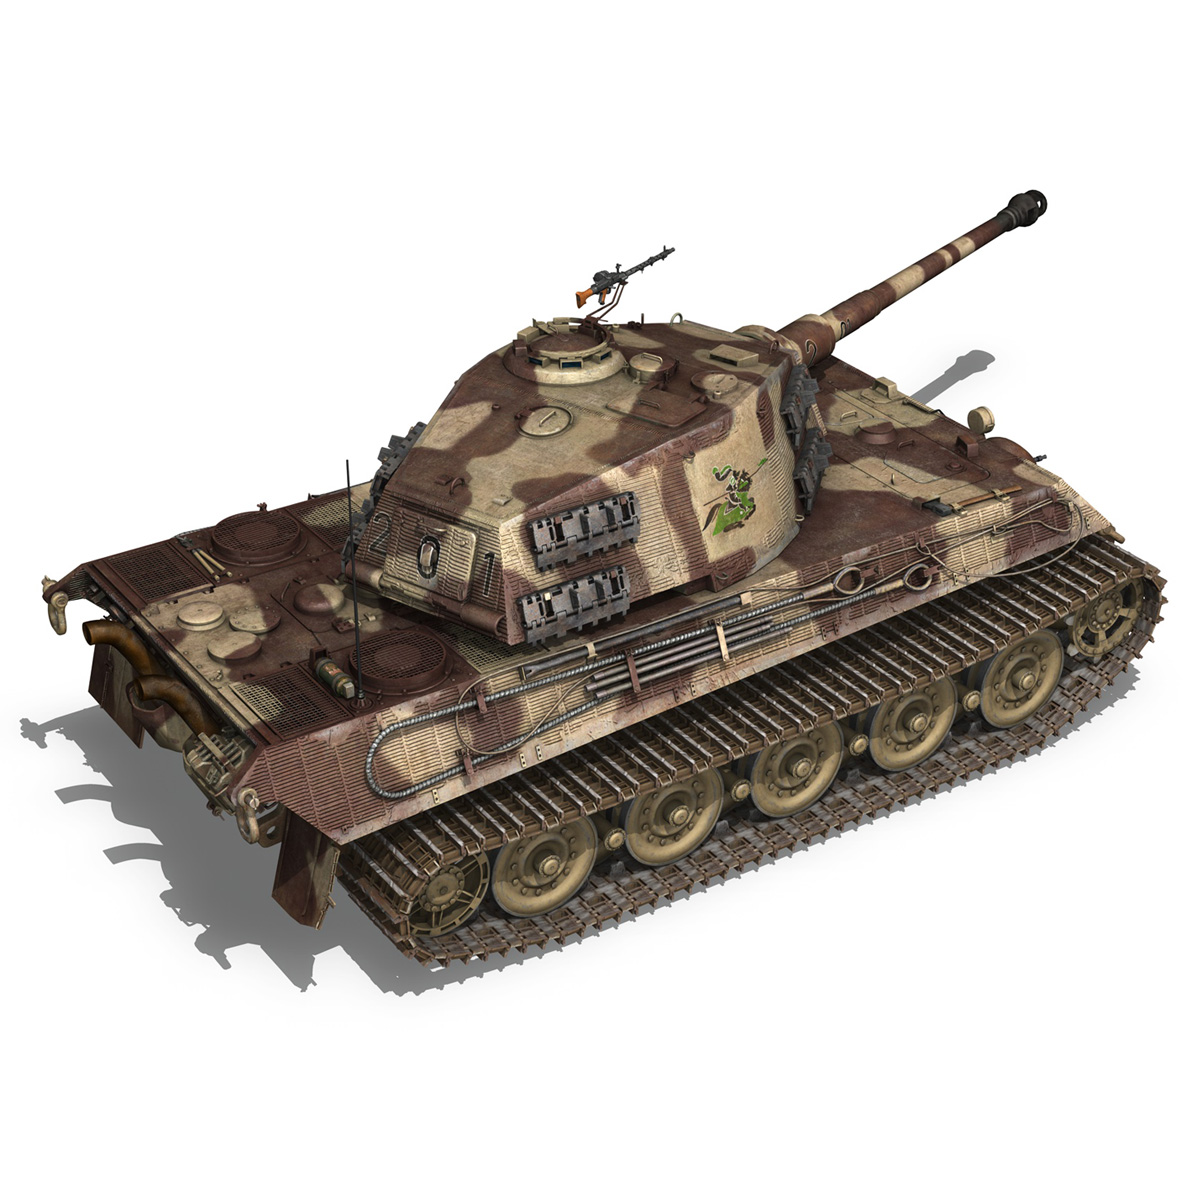 panzerkampfwagen vi – ausf b – tiger ii – 201 3d model 3ds c4d lwo lw lws obj 293307